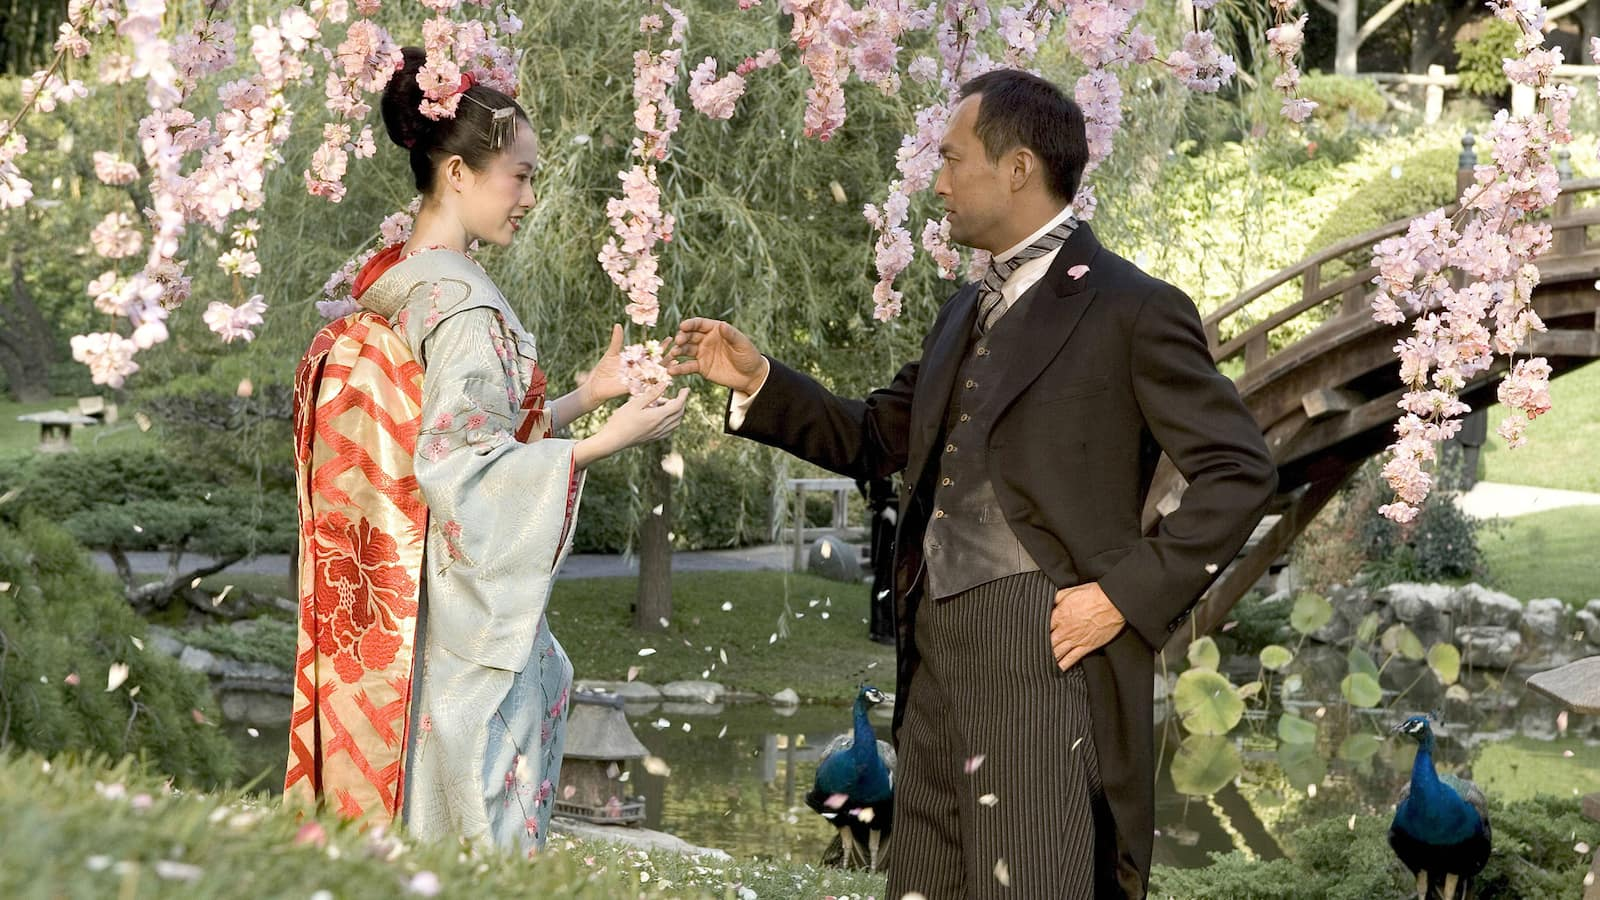 en-geishas-memoarer-2005